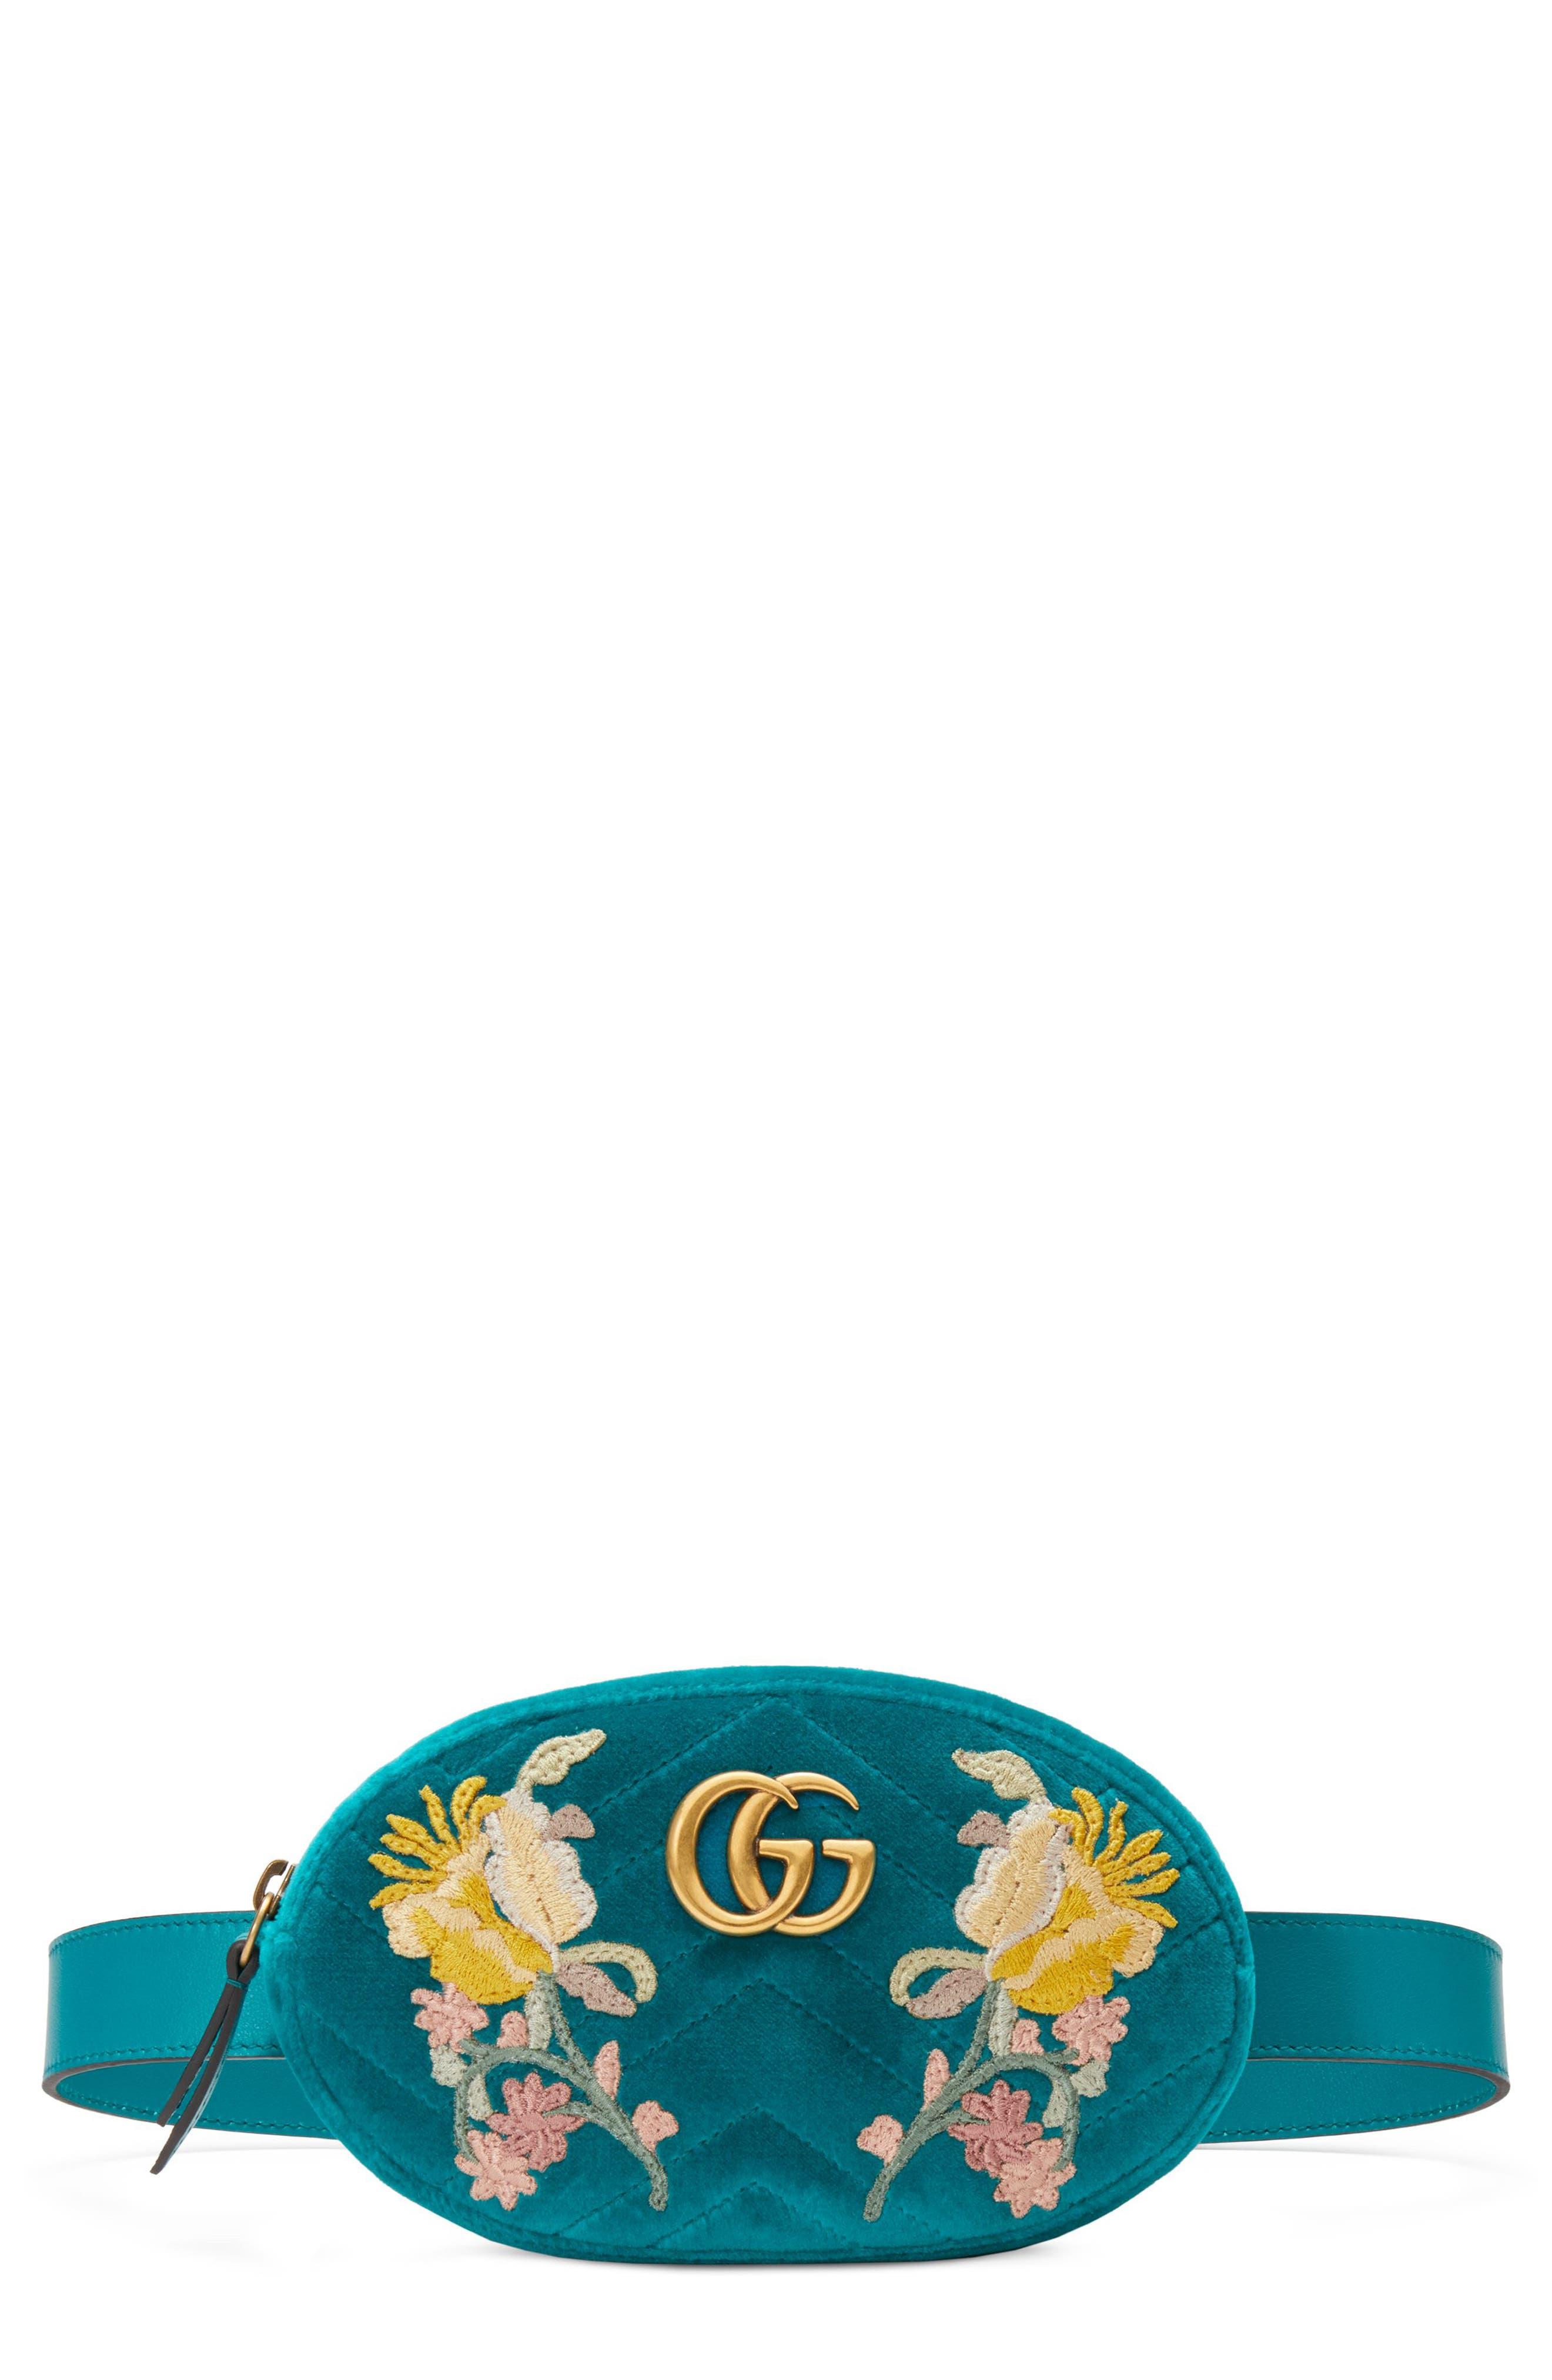 GG Marmont 2.0 Embroidered Velvet Belt Bag,                         Main,                         color, Pavone/ Pavone/ Cyan Multi